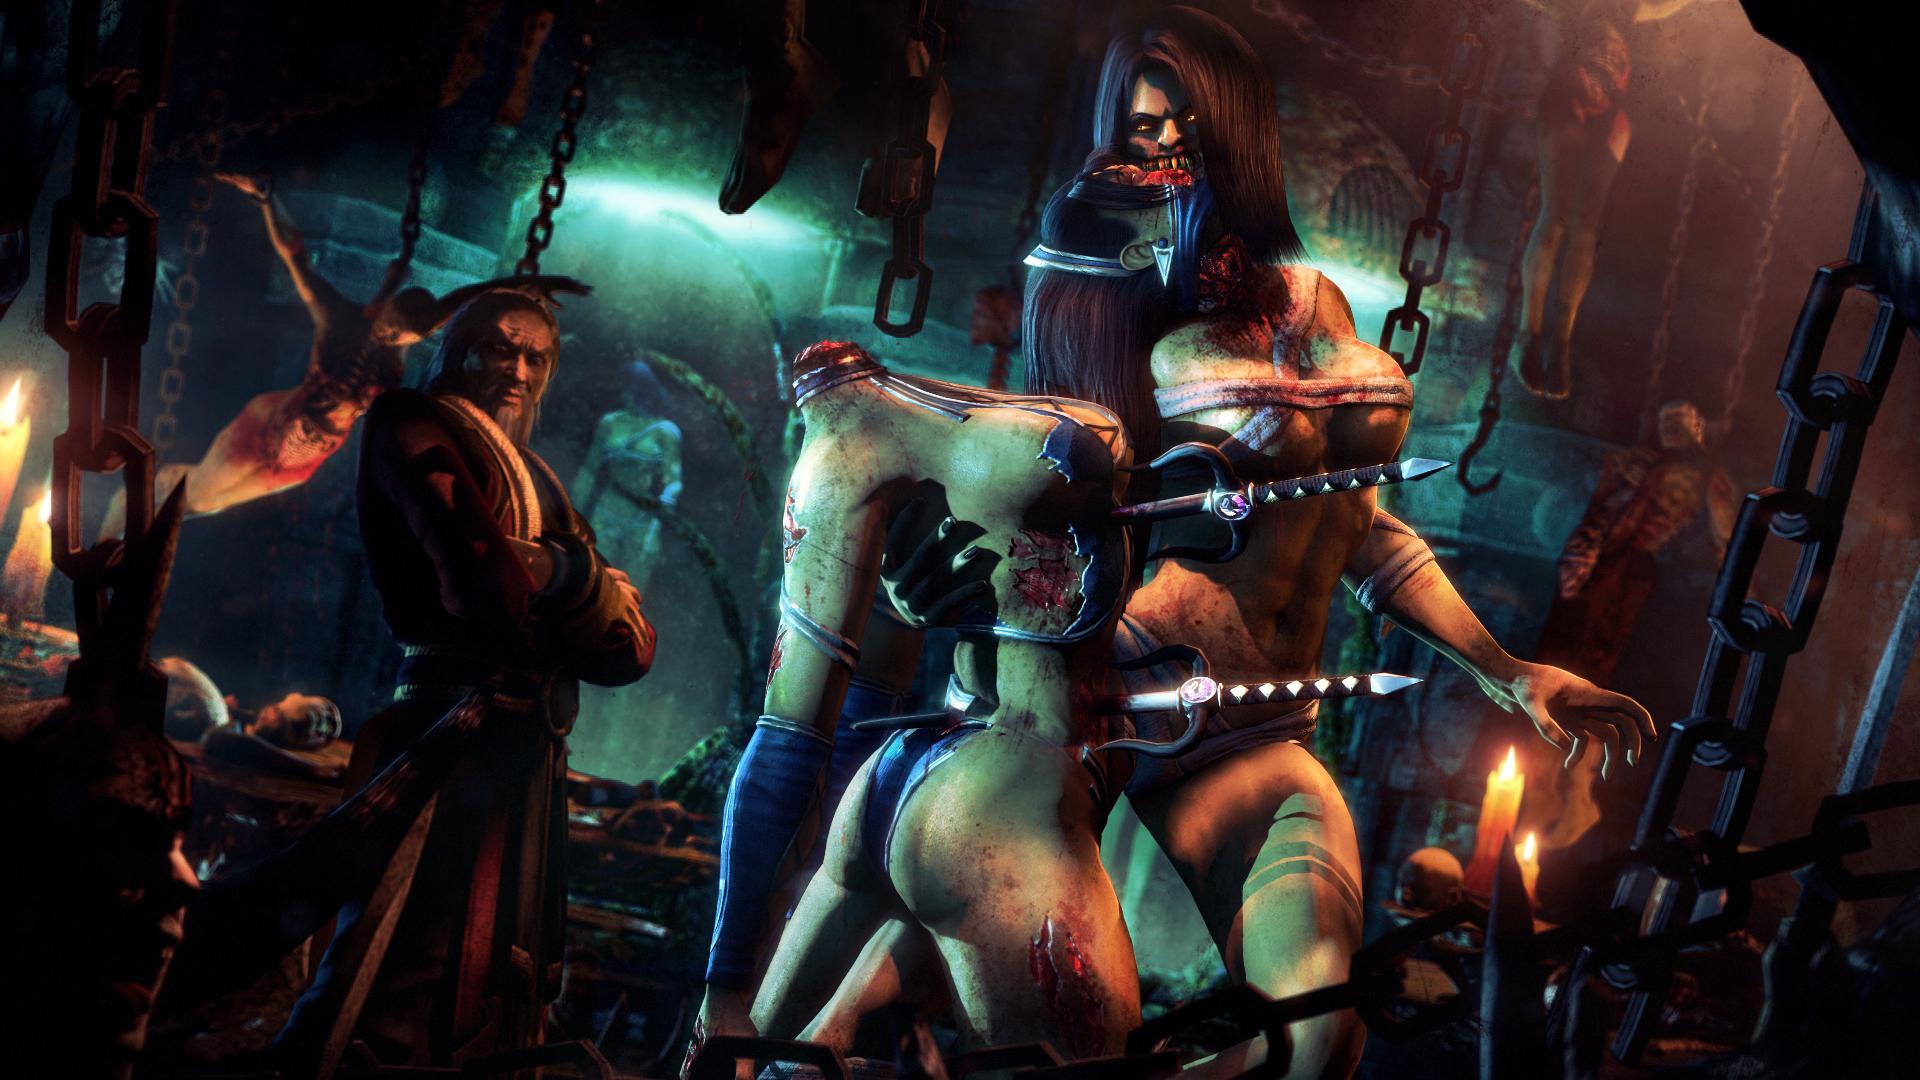 Mortal kombat bloody porn pics sex photo